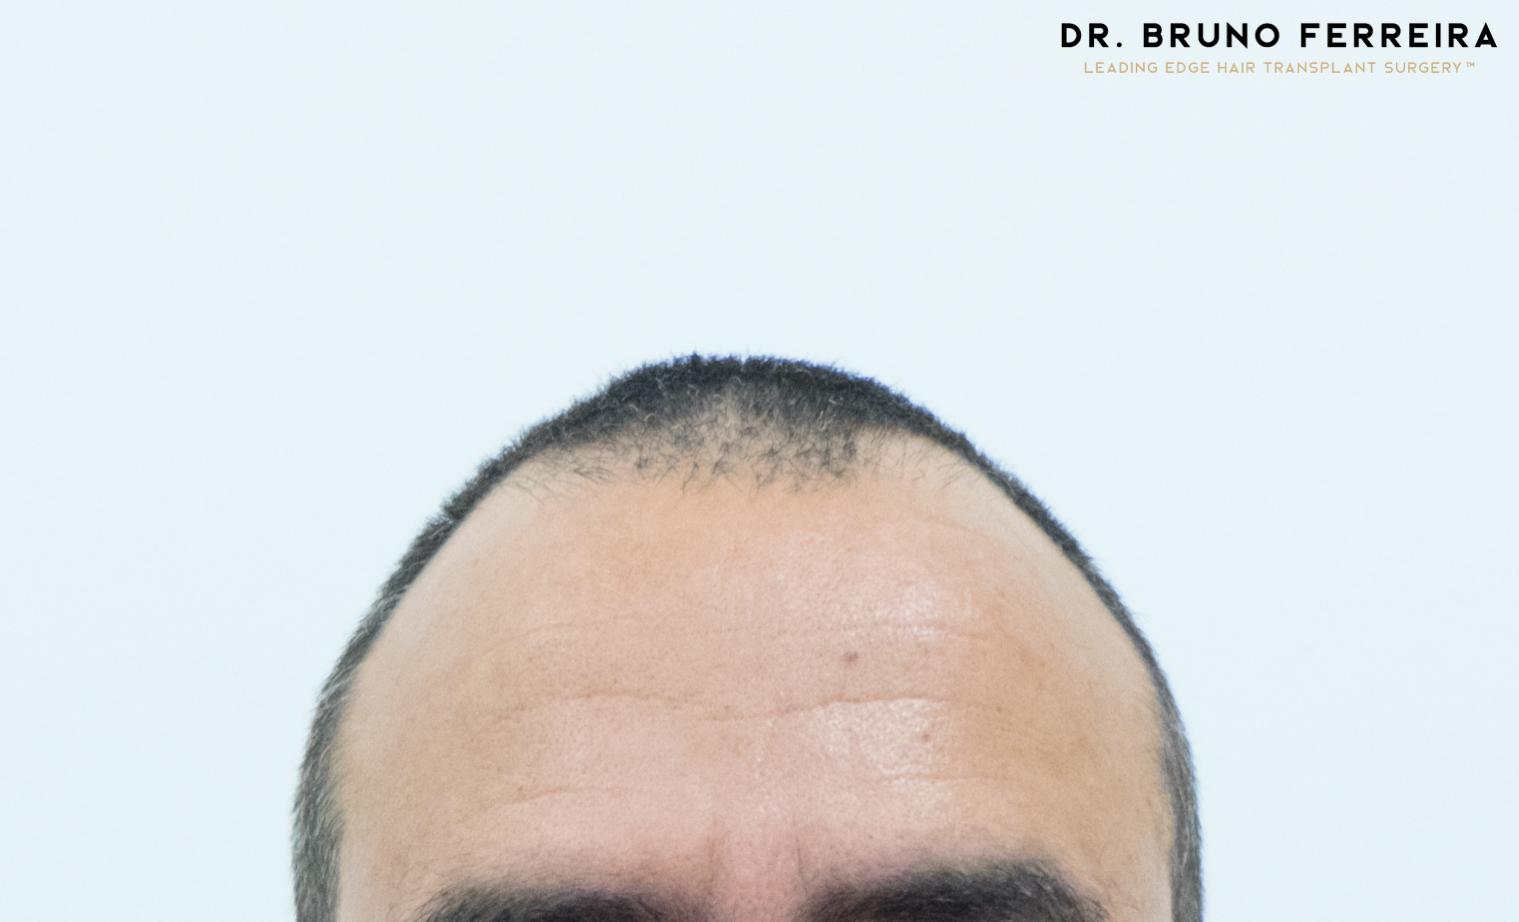 00000 DR. BRUNO FERREIRA (Case 1) - Before - 1.jpg